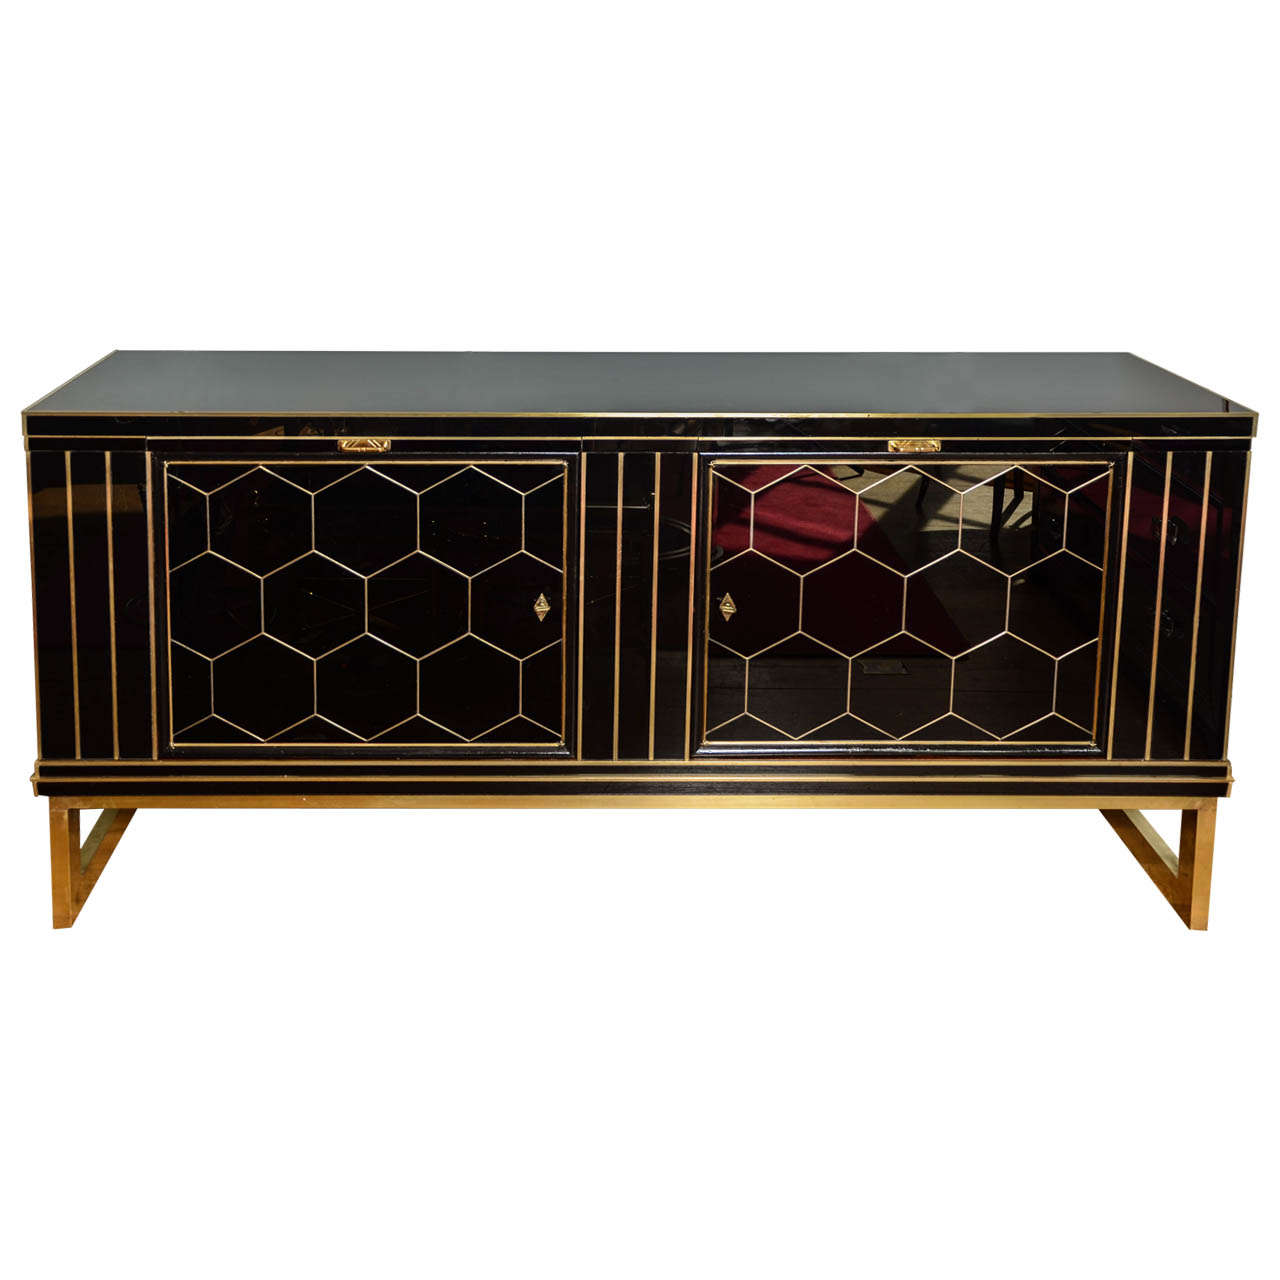 Imposing Italian Black Glass Sideboard 1 - Imposing Italian Black Glass Sideboard At 1stdibs